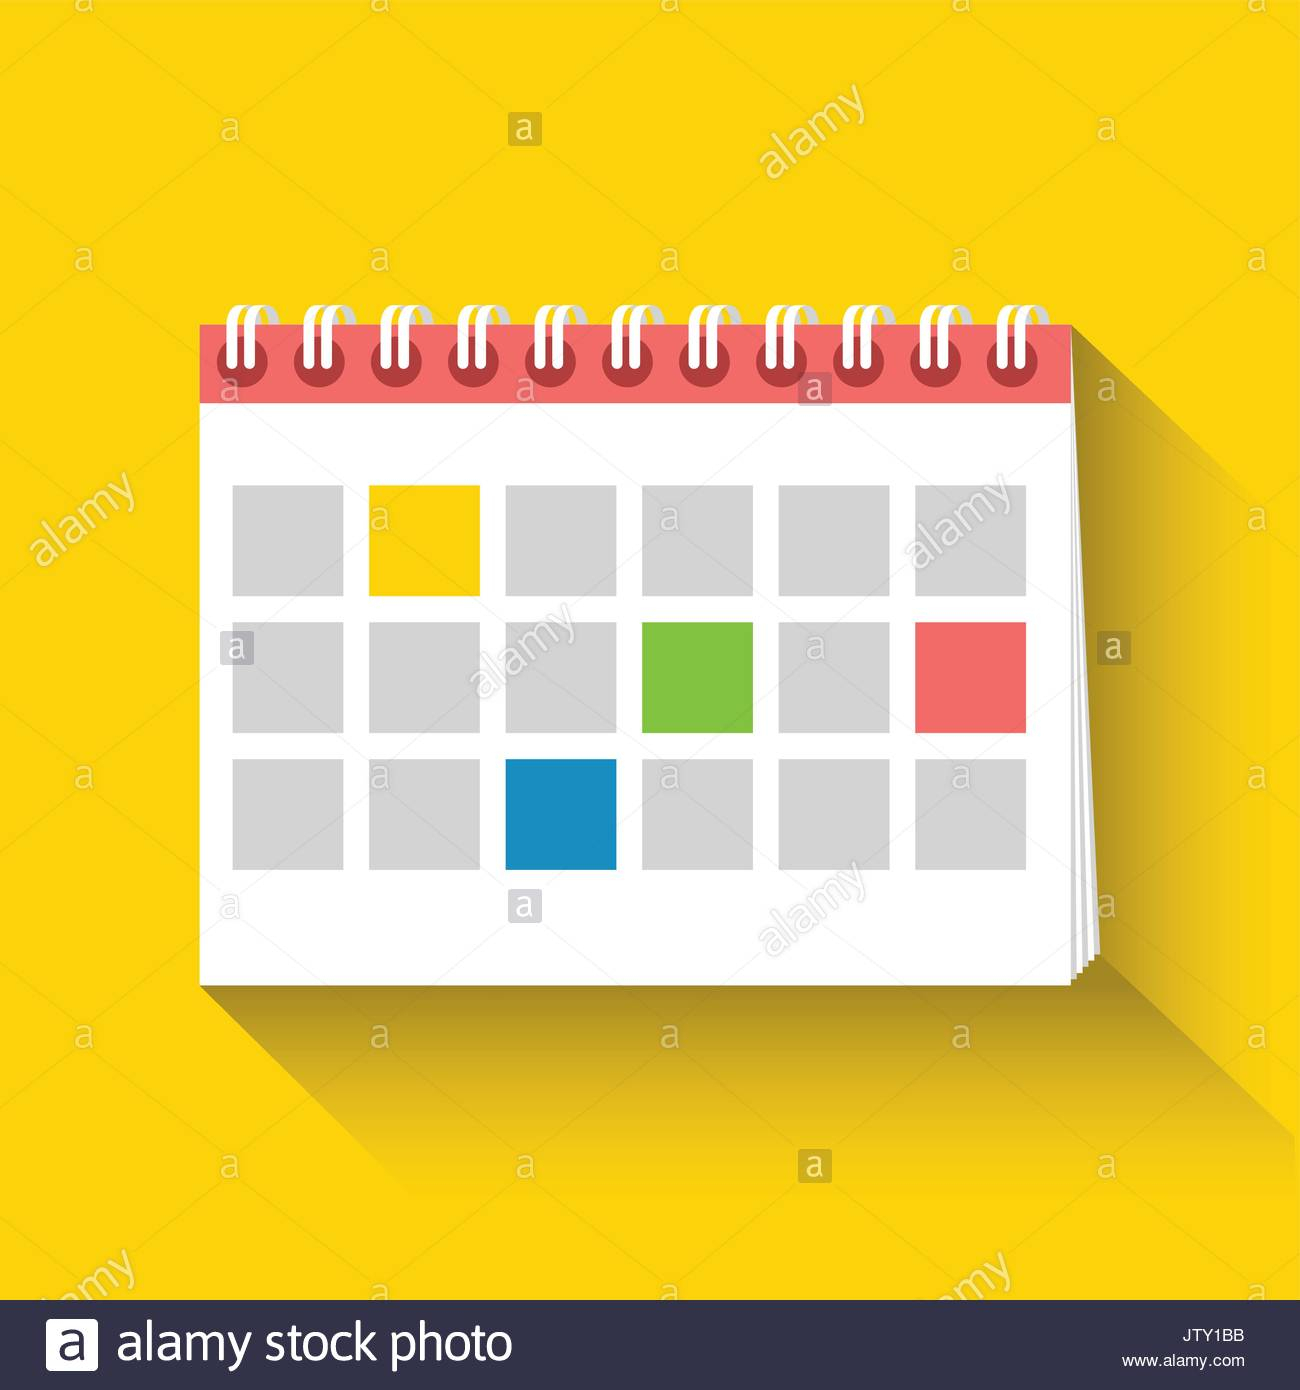 Table Calendar Flat Icon. Flat Design. Vector Illustration regarding Calendar Flat Design